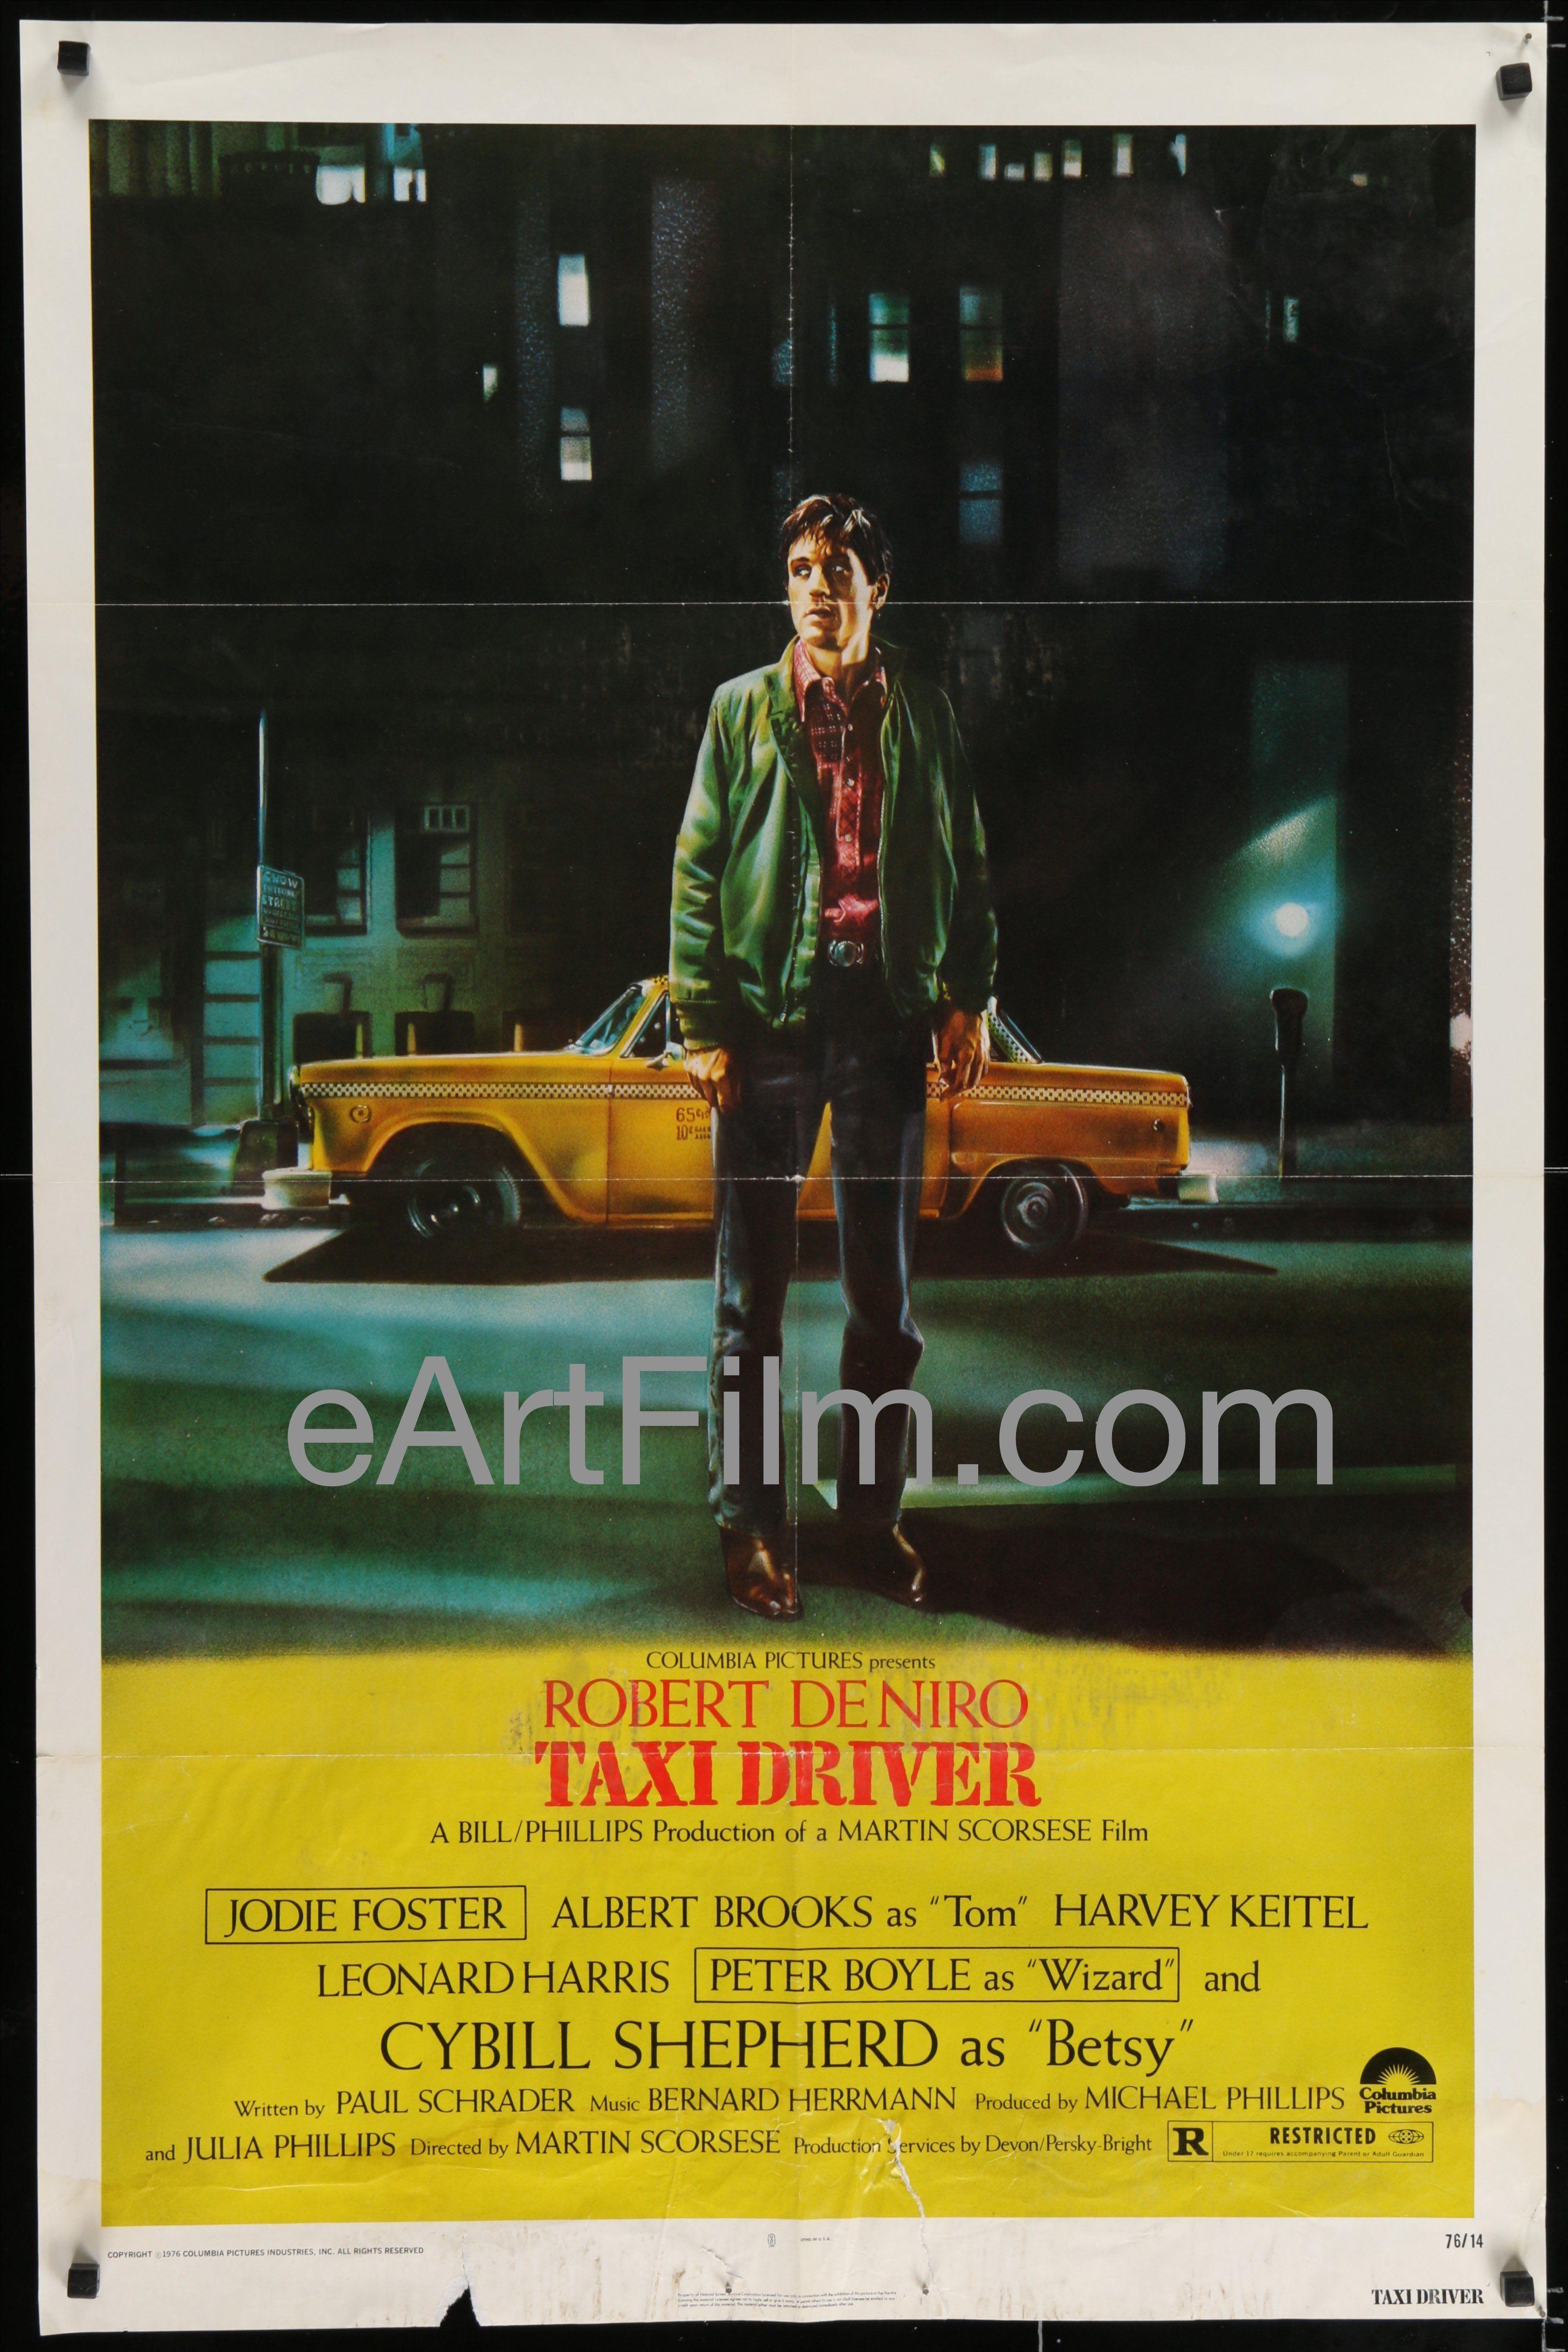 Taxi Driver Robert De Niro Martin Scorsese original movie